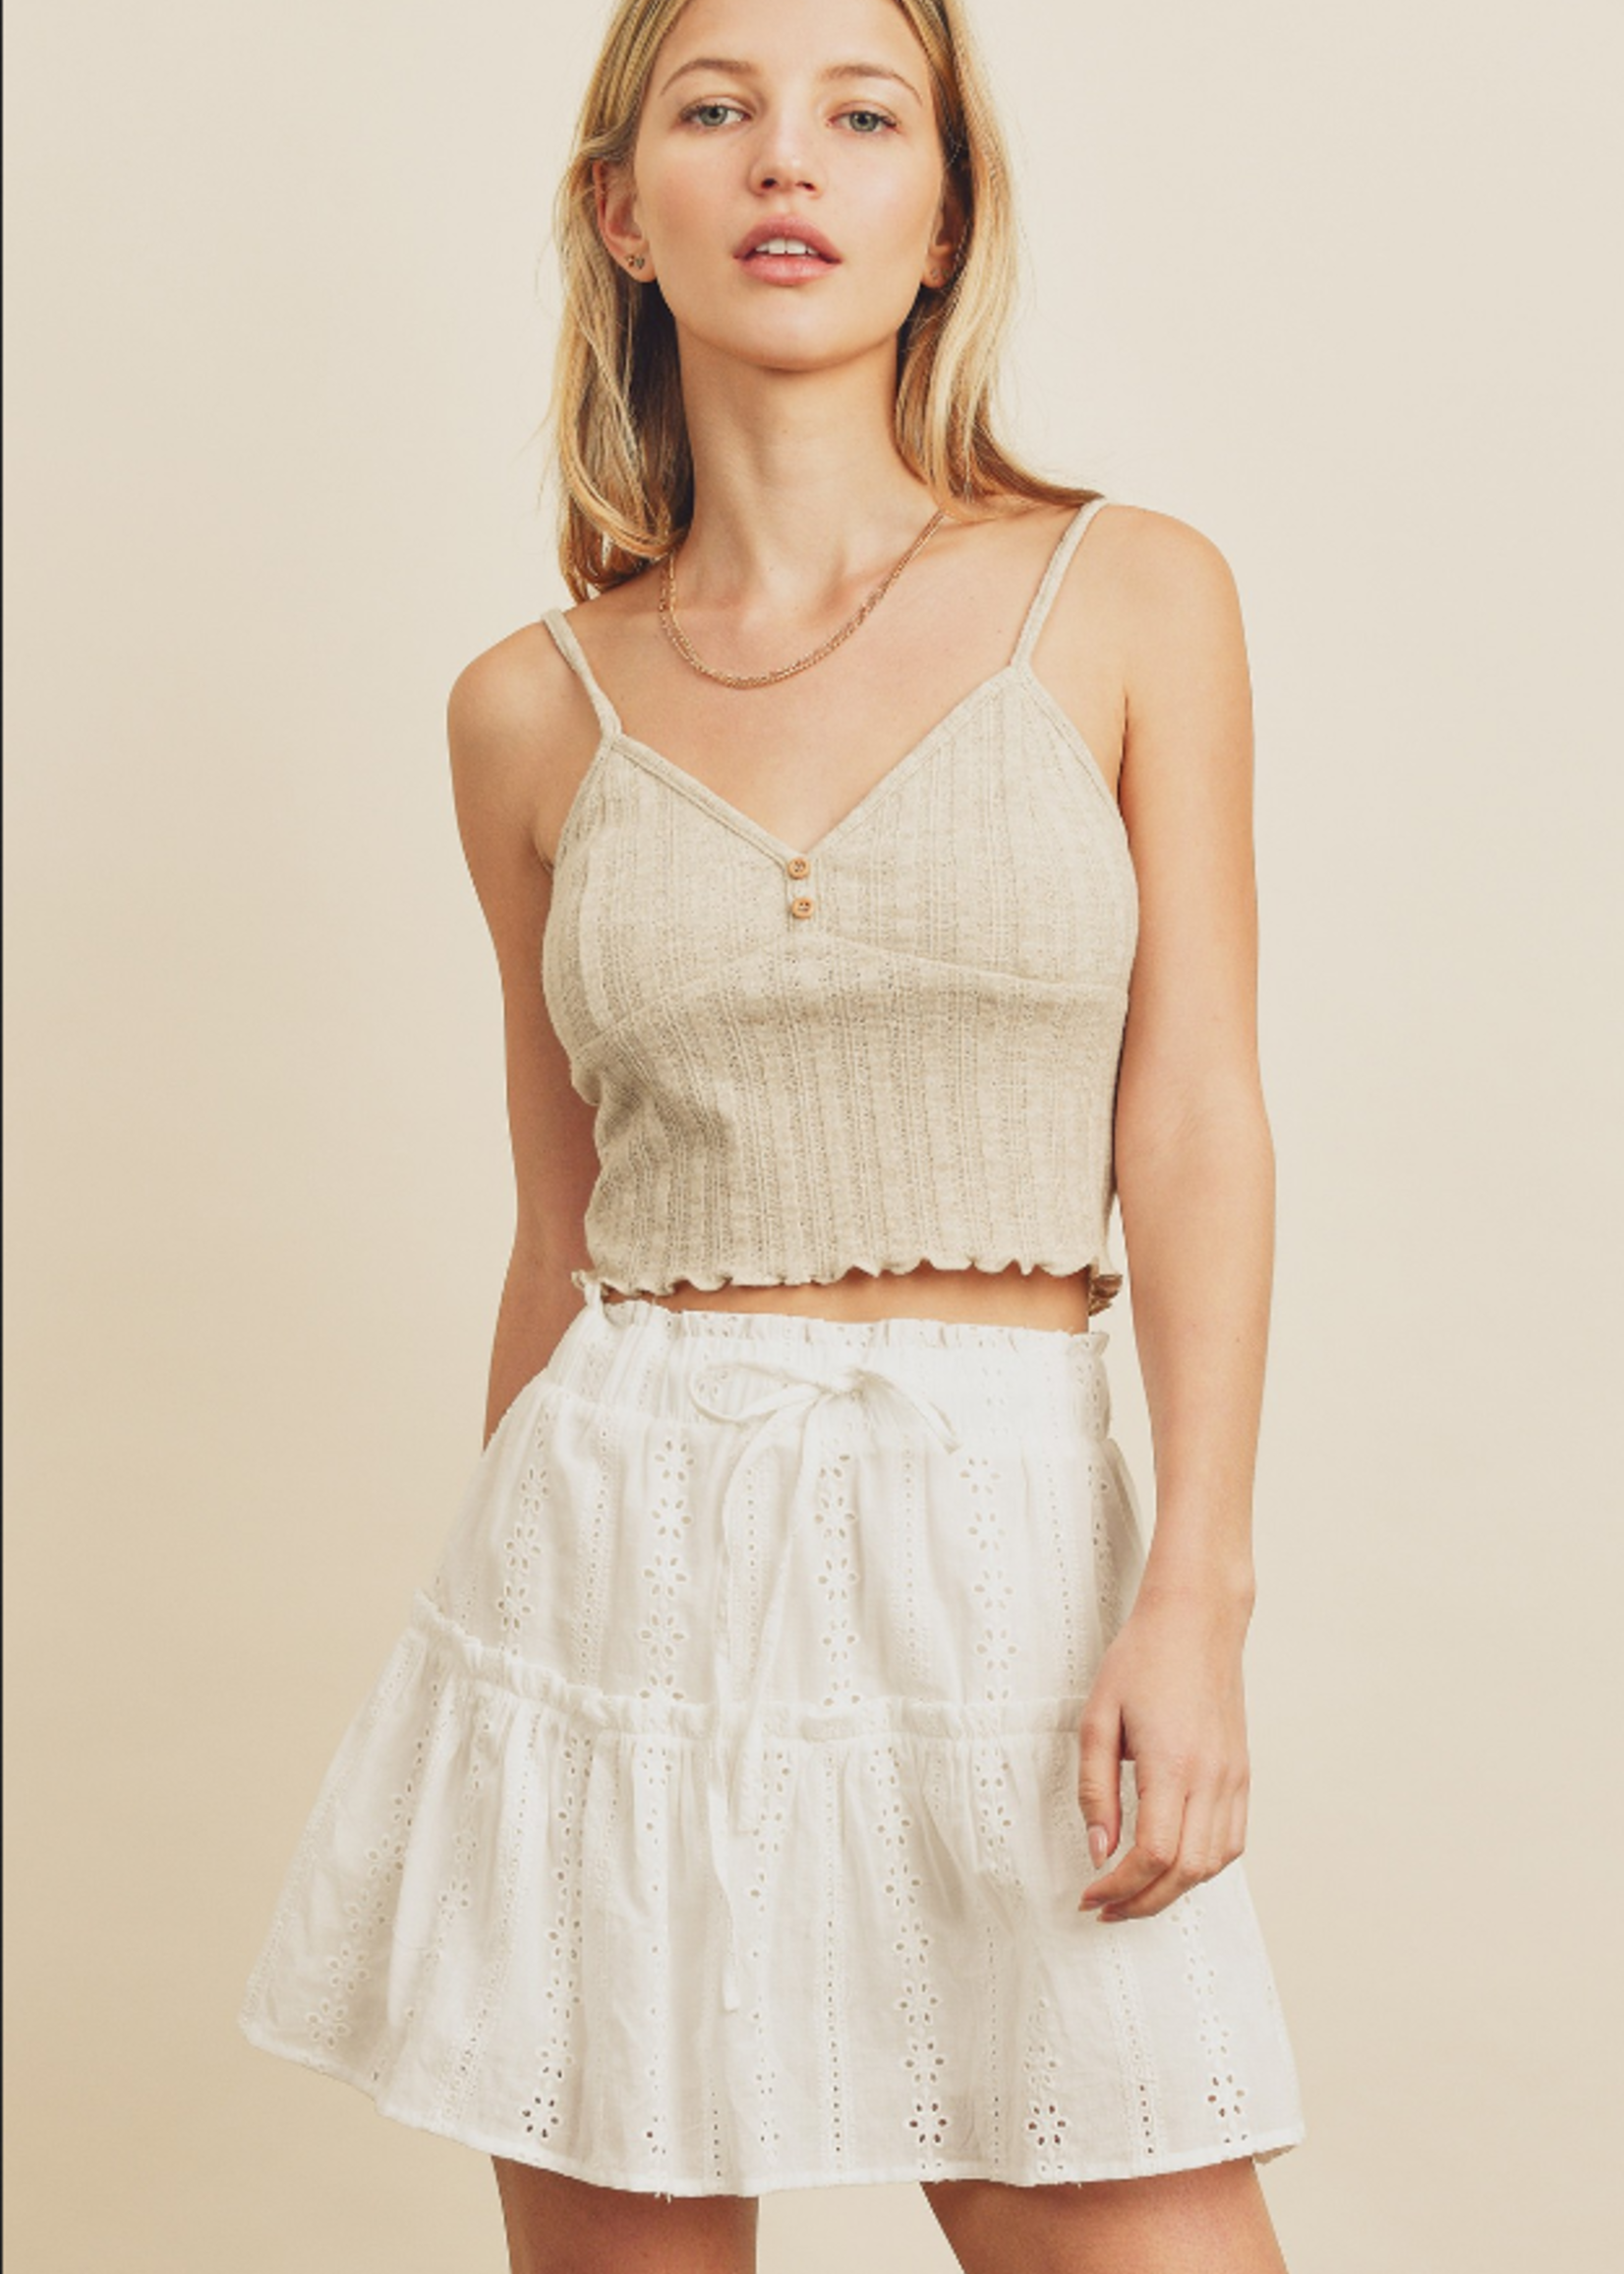 Eyelet Skirt with Lining - White